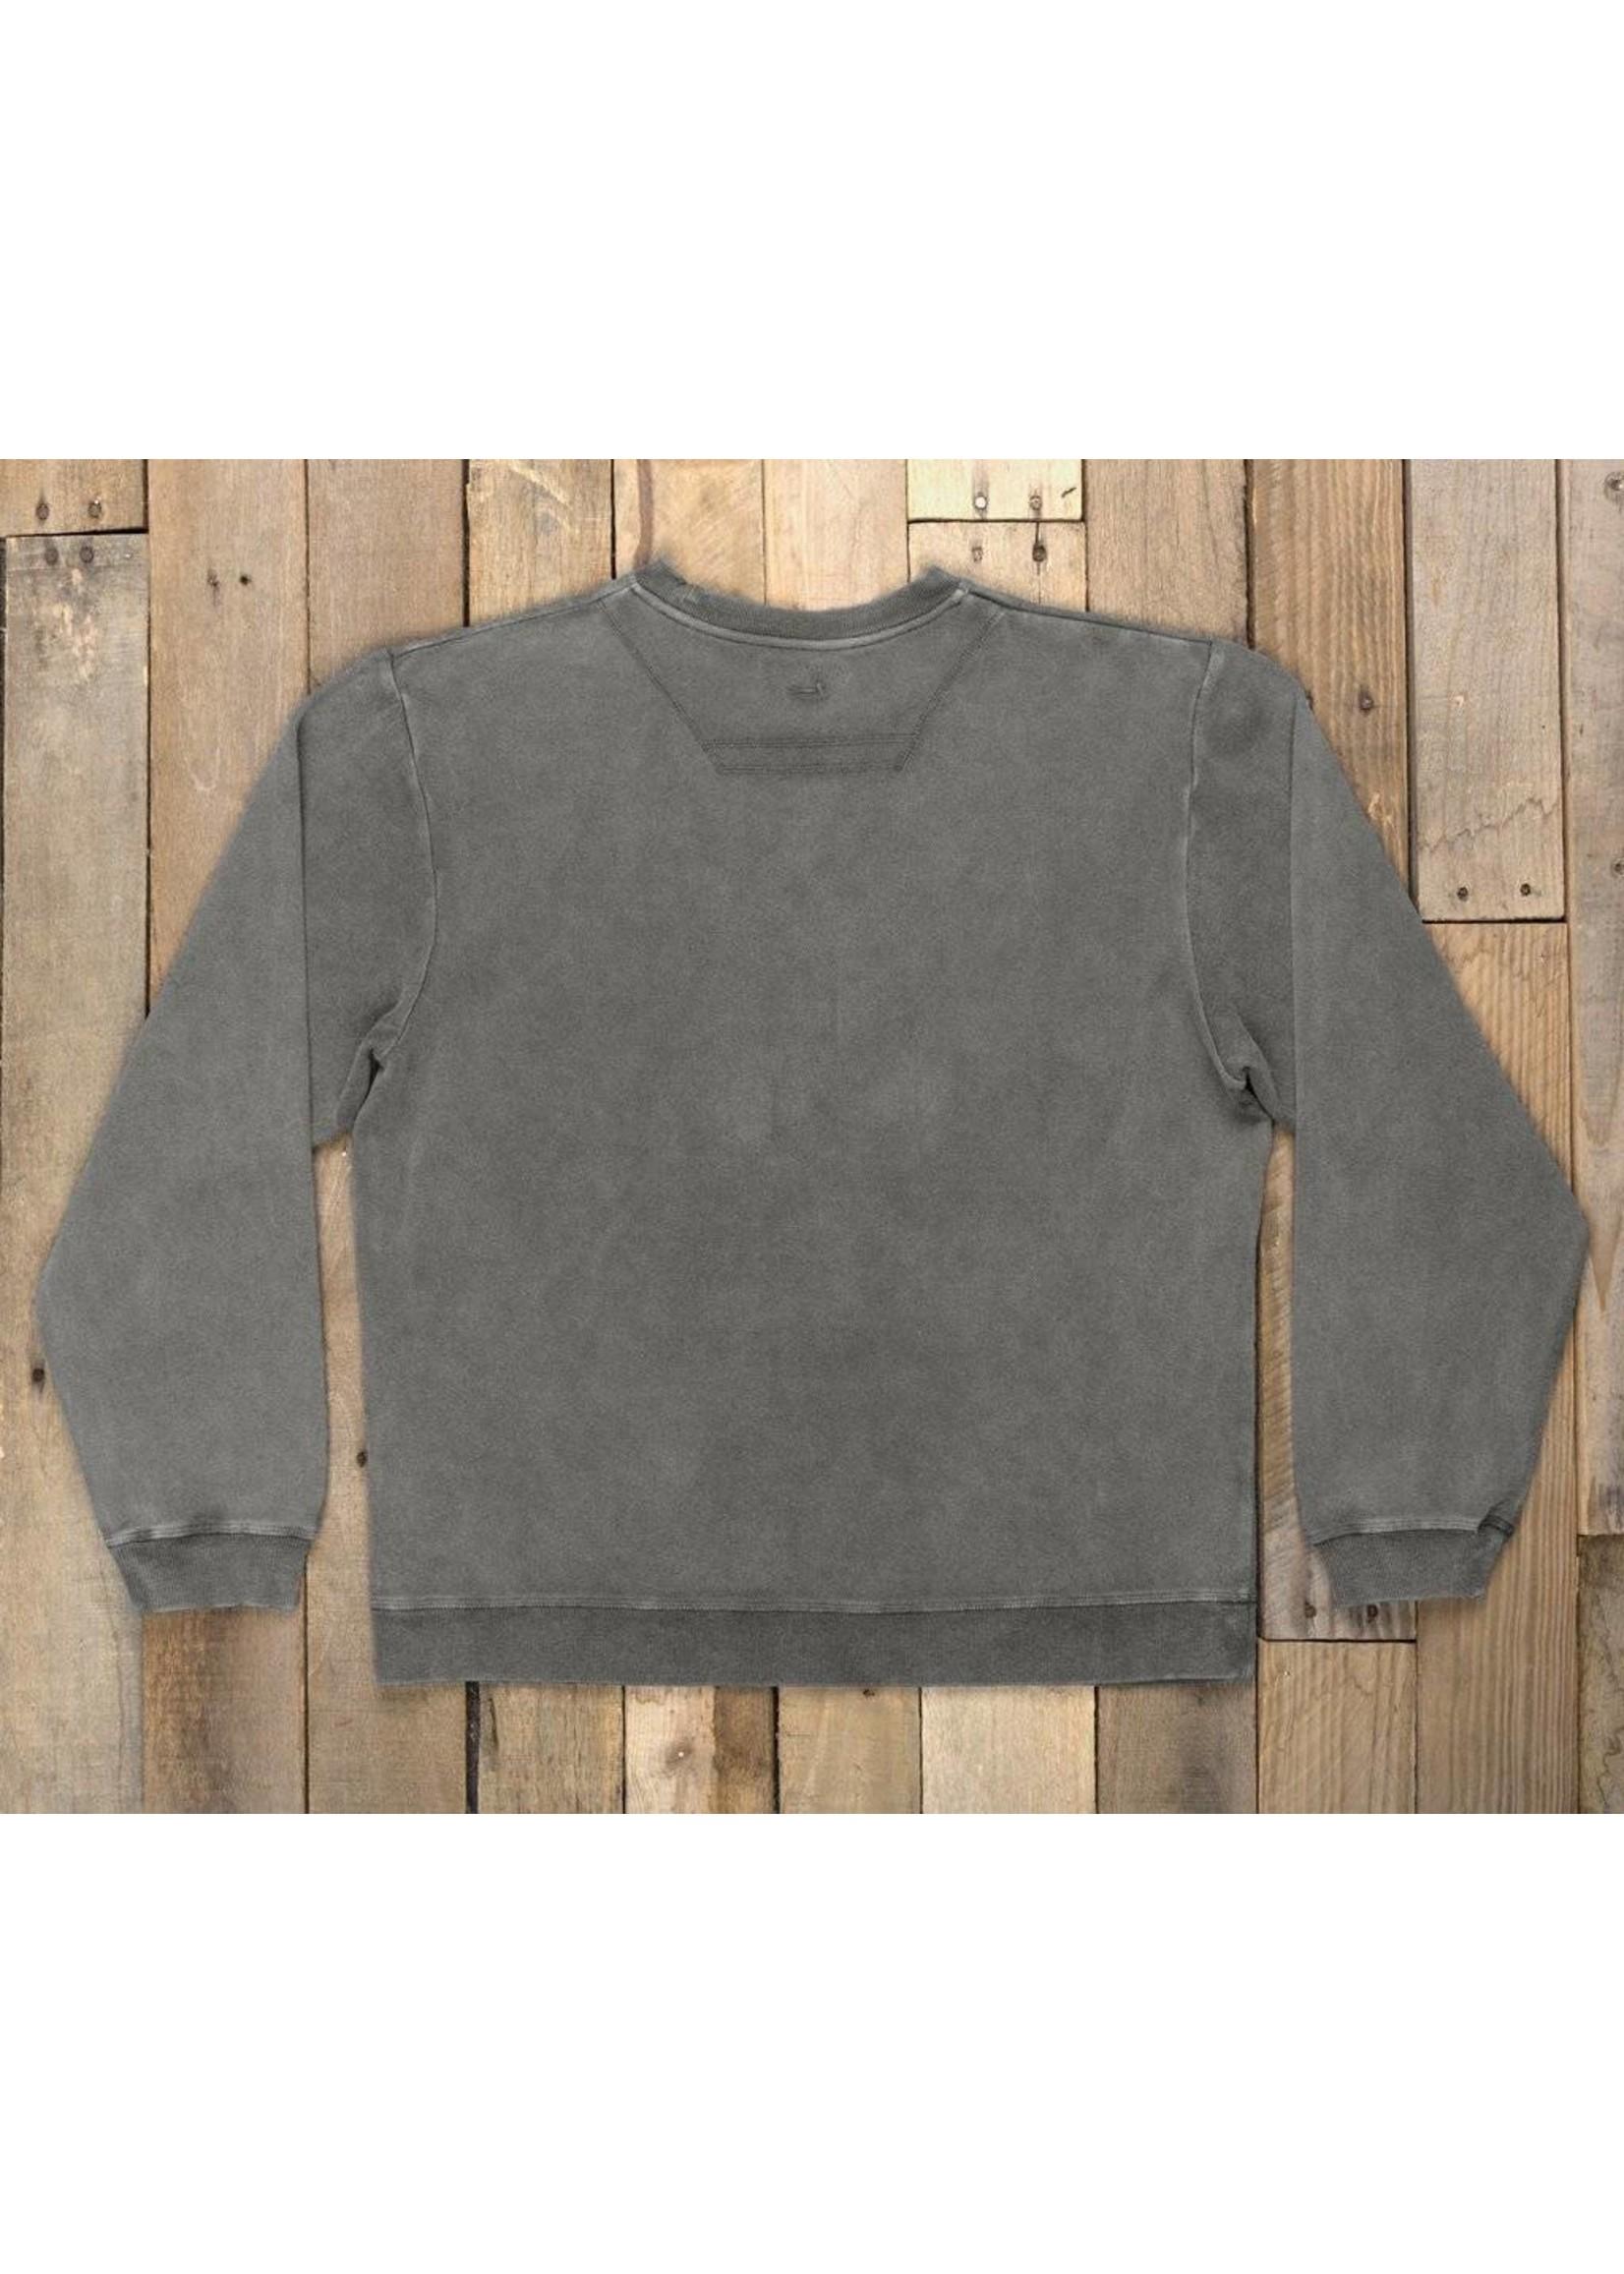 Southern Marsh SEAWASH™ Sweatshirt - Northshore